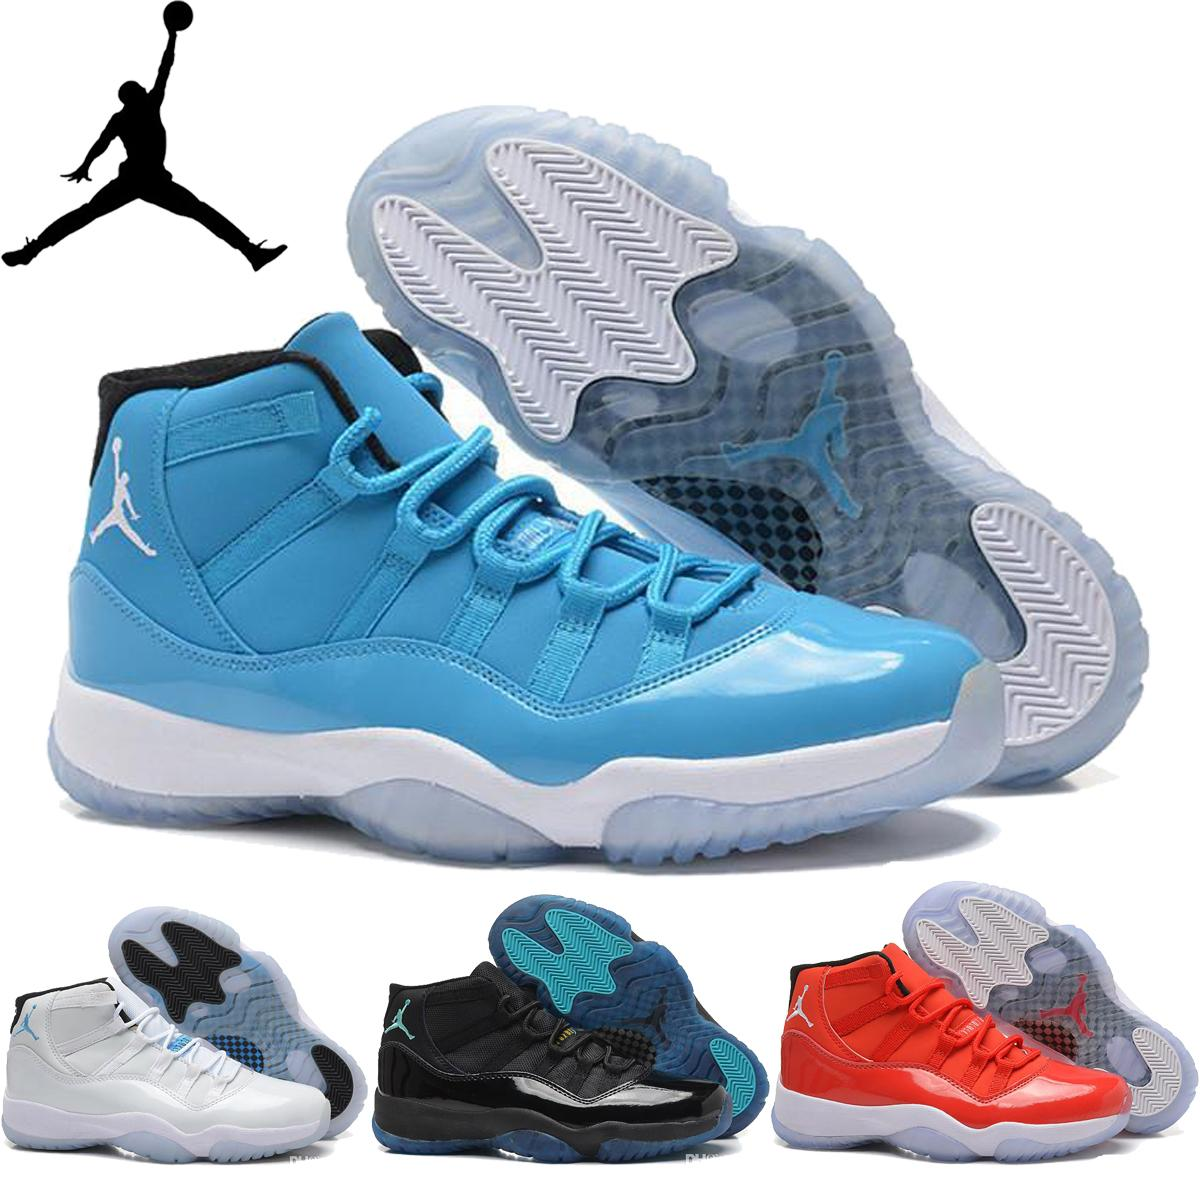 best sneakers ff0c8 65db8 Großhandel Nike Air Jordan 11 Retro XI Männer Frauen Basketball Schuh Bred  Concord 72 10 Gamma Blau Ultimate Gift Of Flight Für Herren AJ11 Turnschuhe  Von ...